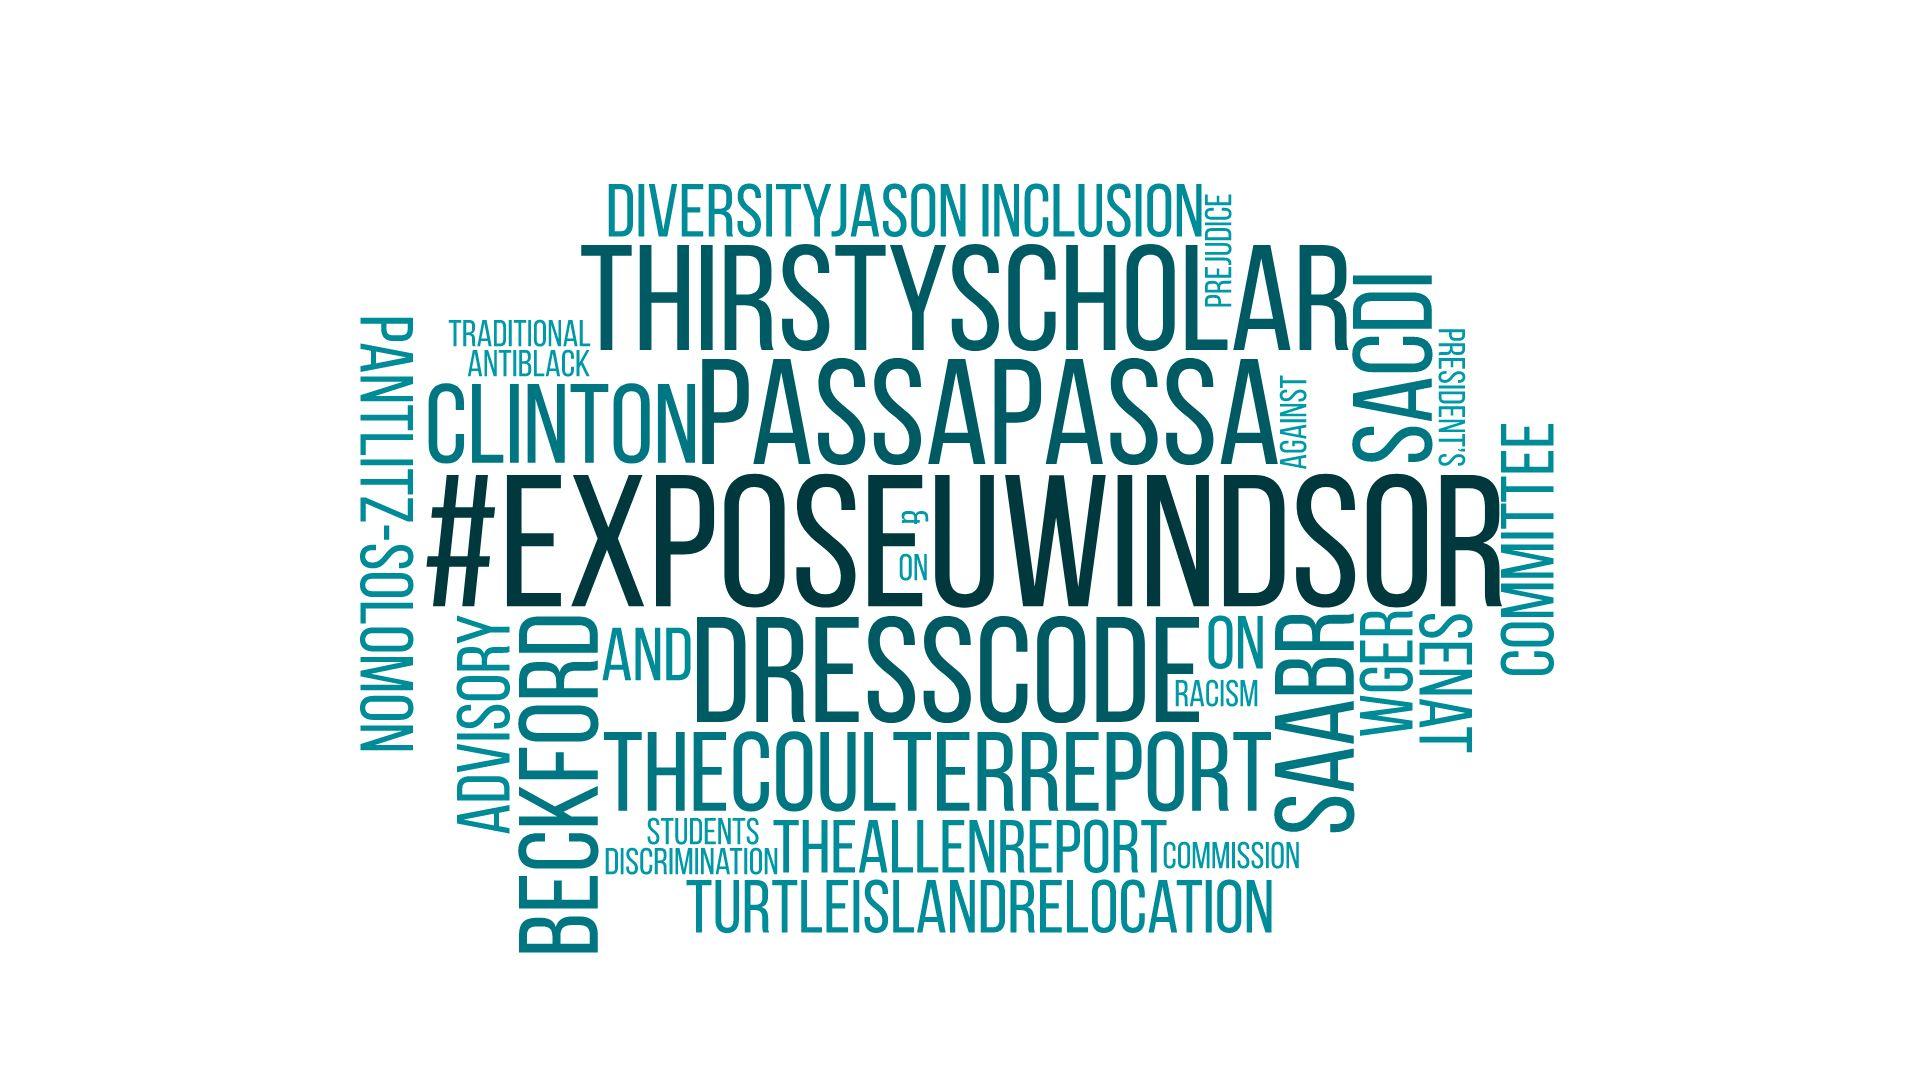 #ExposeUwindsor Danieli Arbex Ryan Flannagan Douglas Kneale